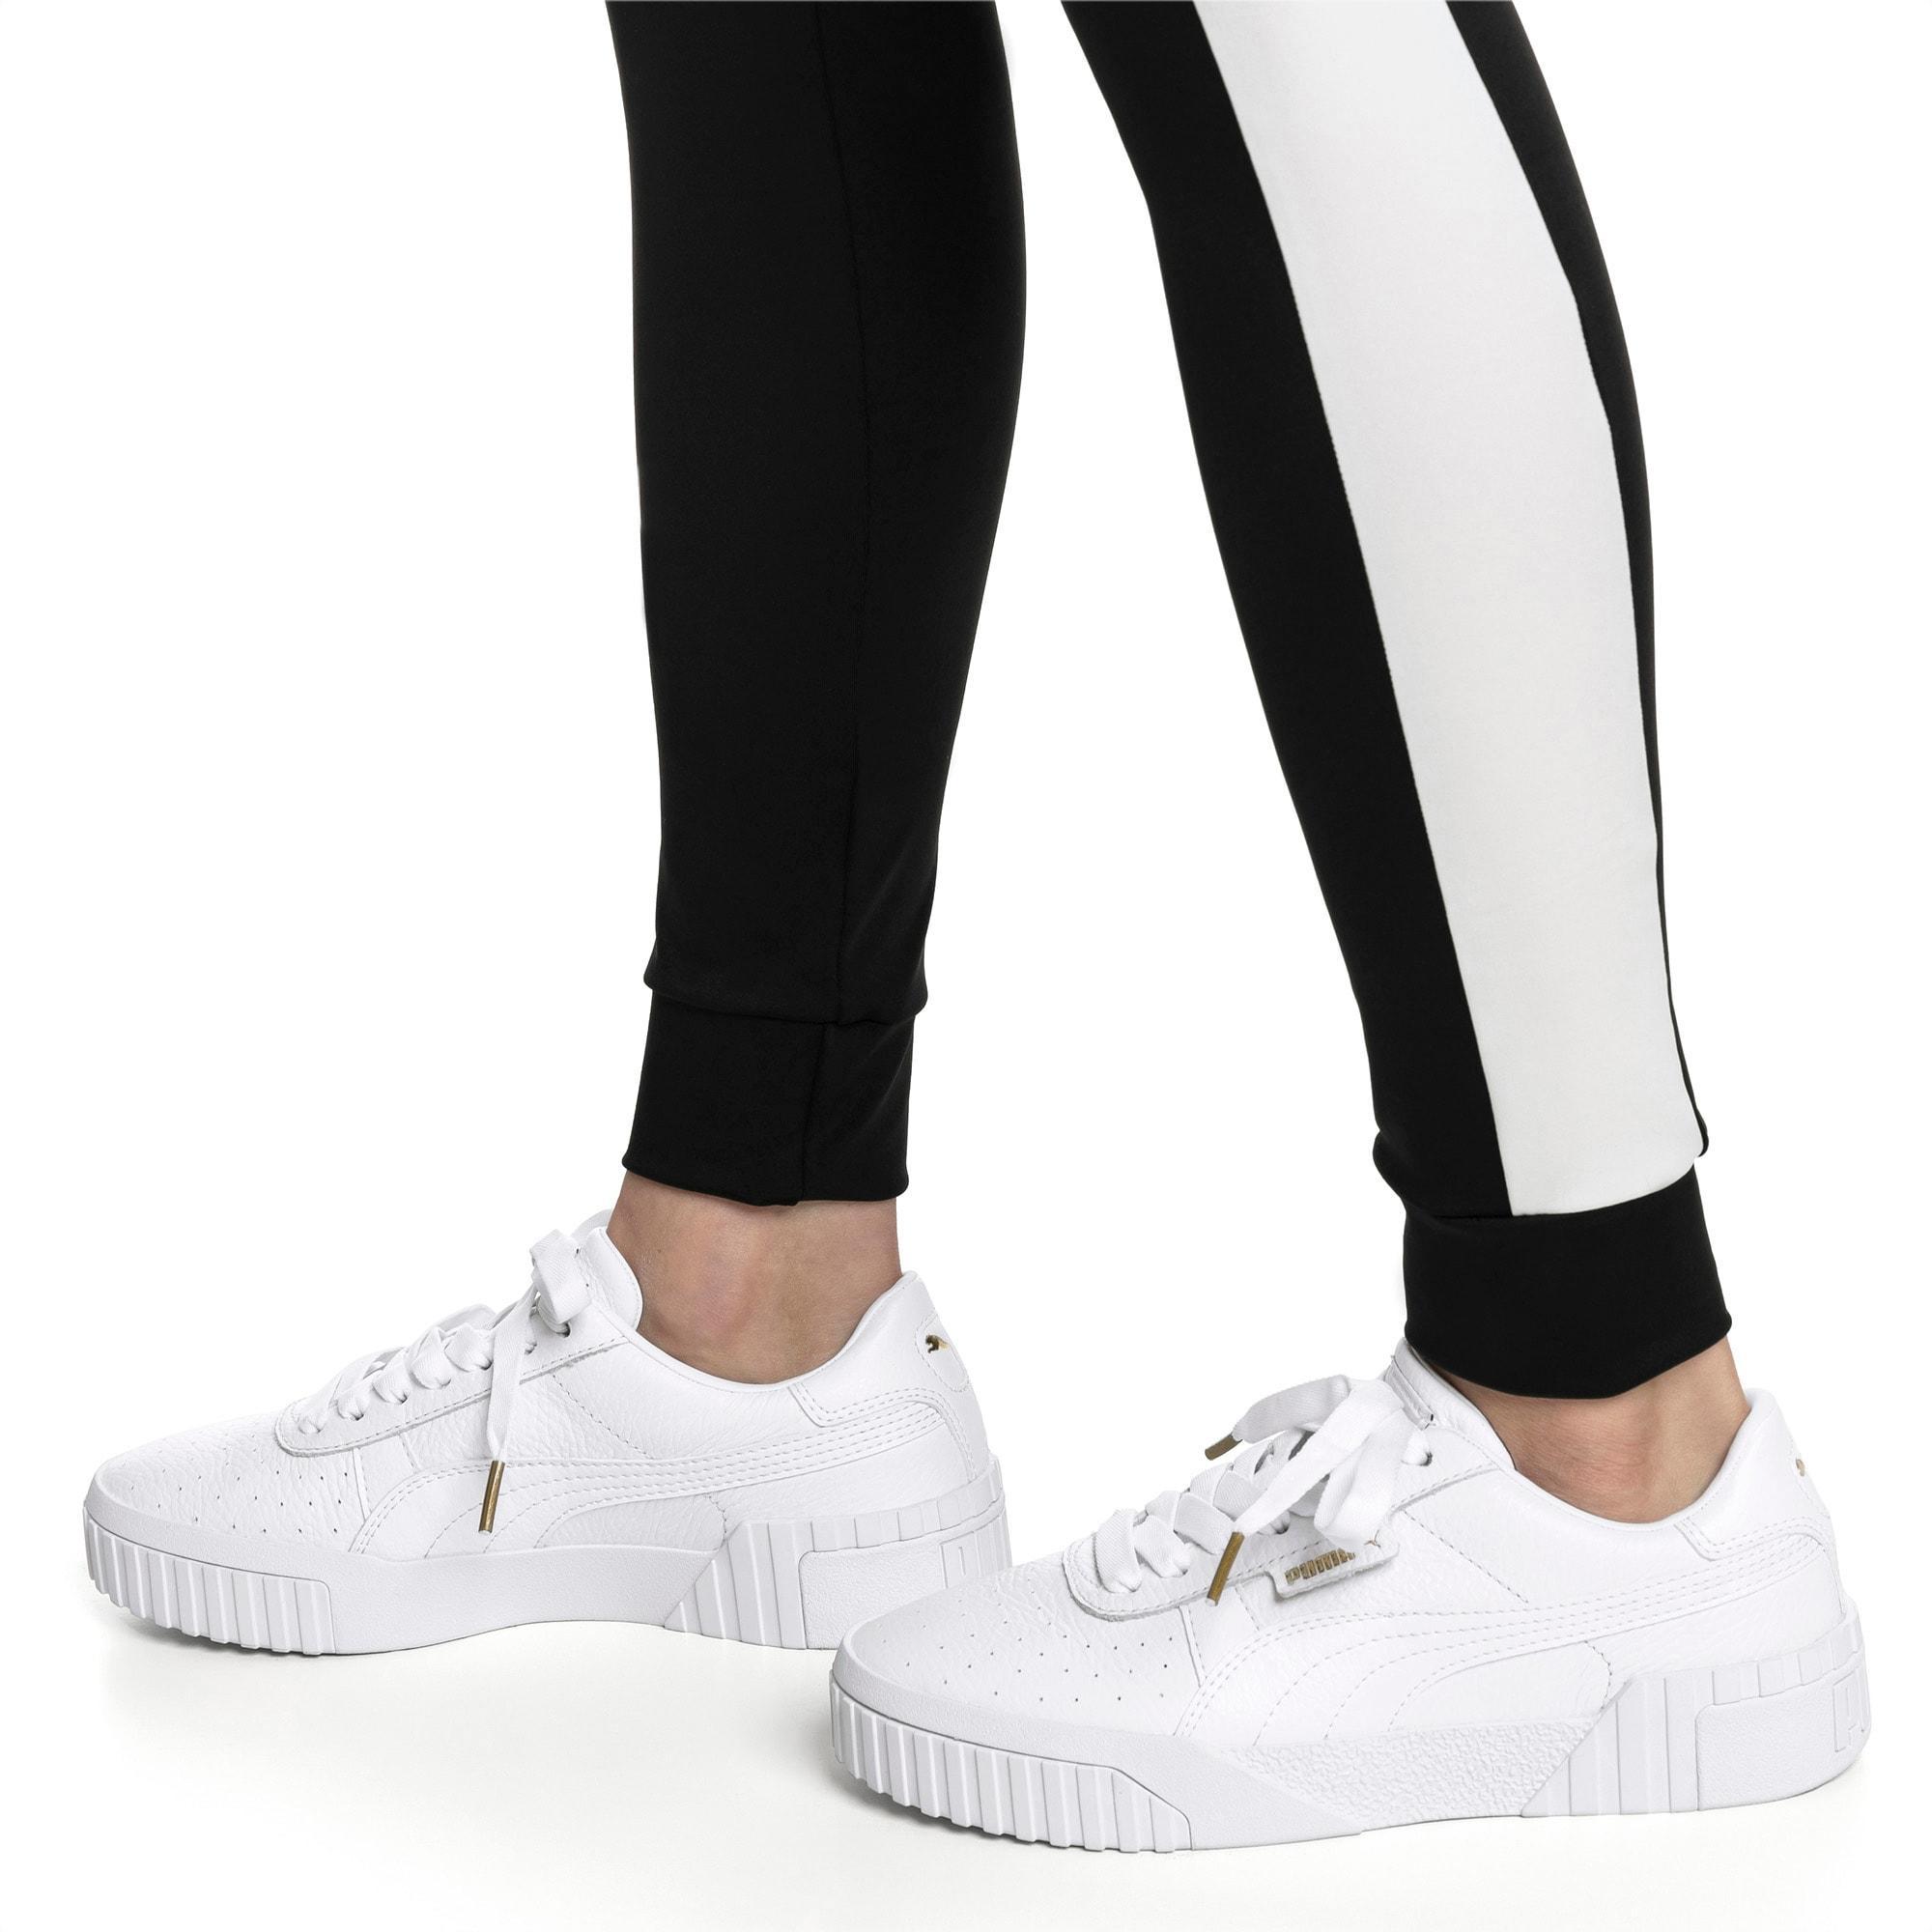 PUMA Leather Cali Women's Sneakers in